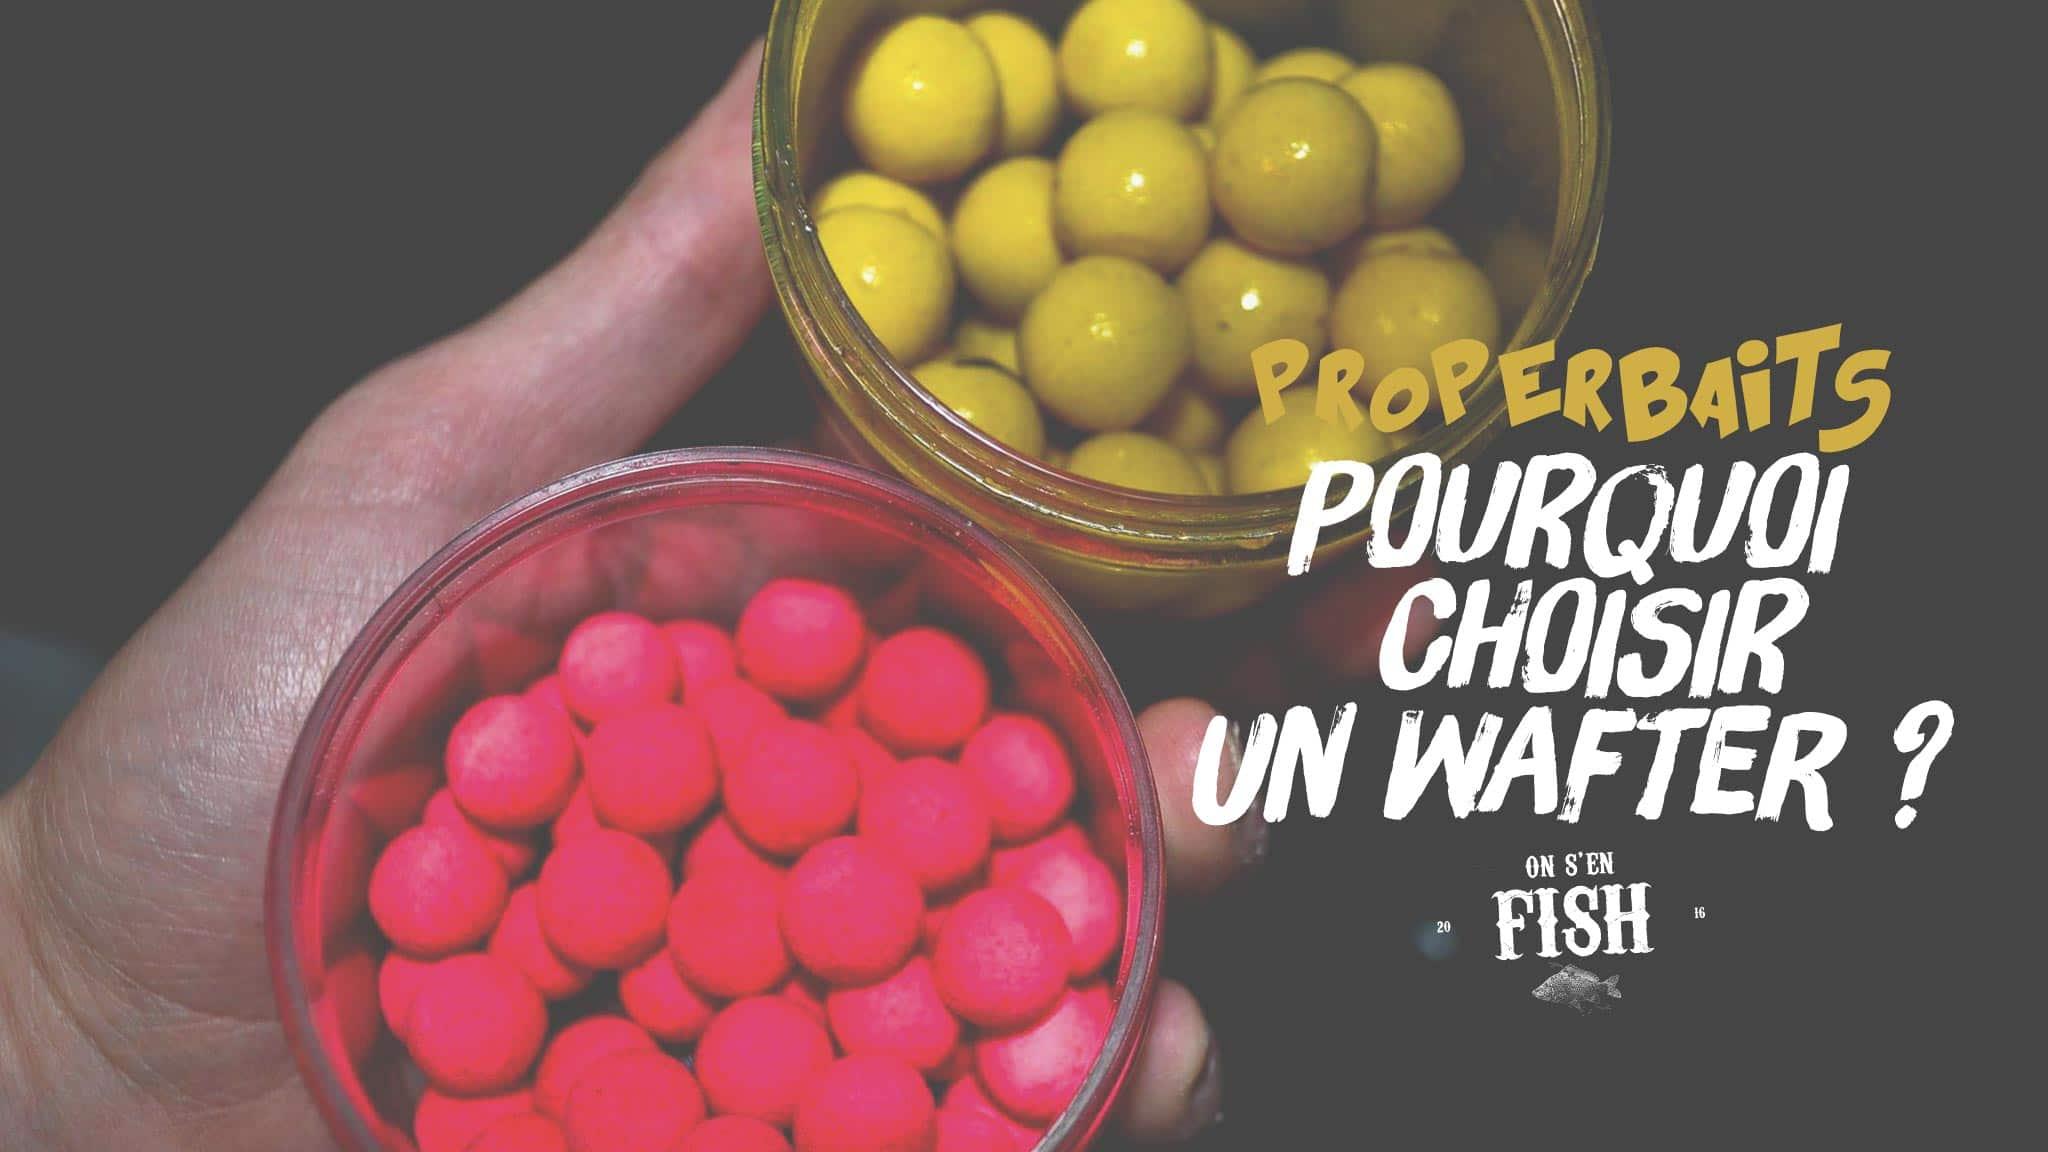 on-s-en-fish-header-properbaits-2-peche-au-wafter